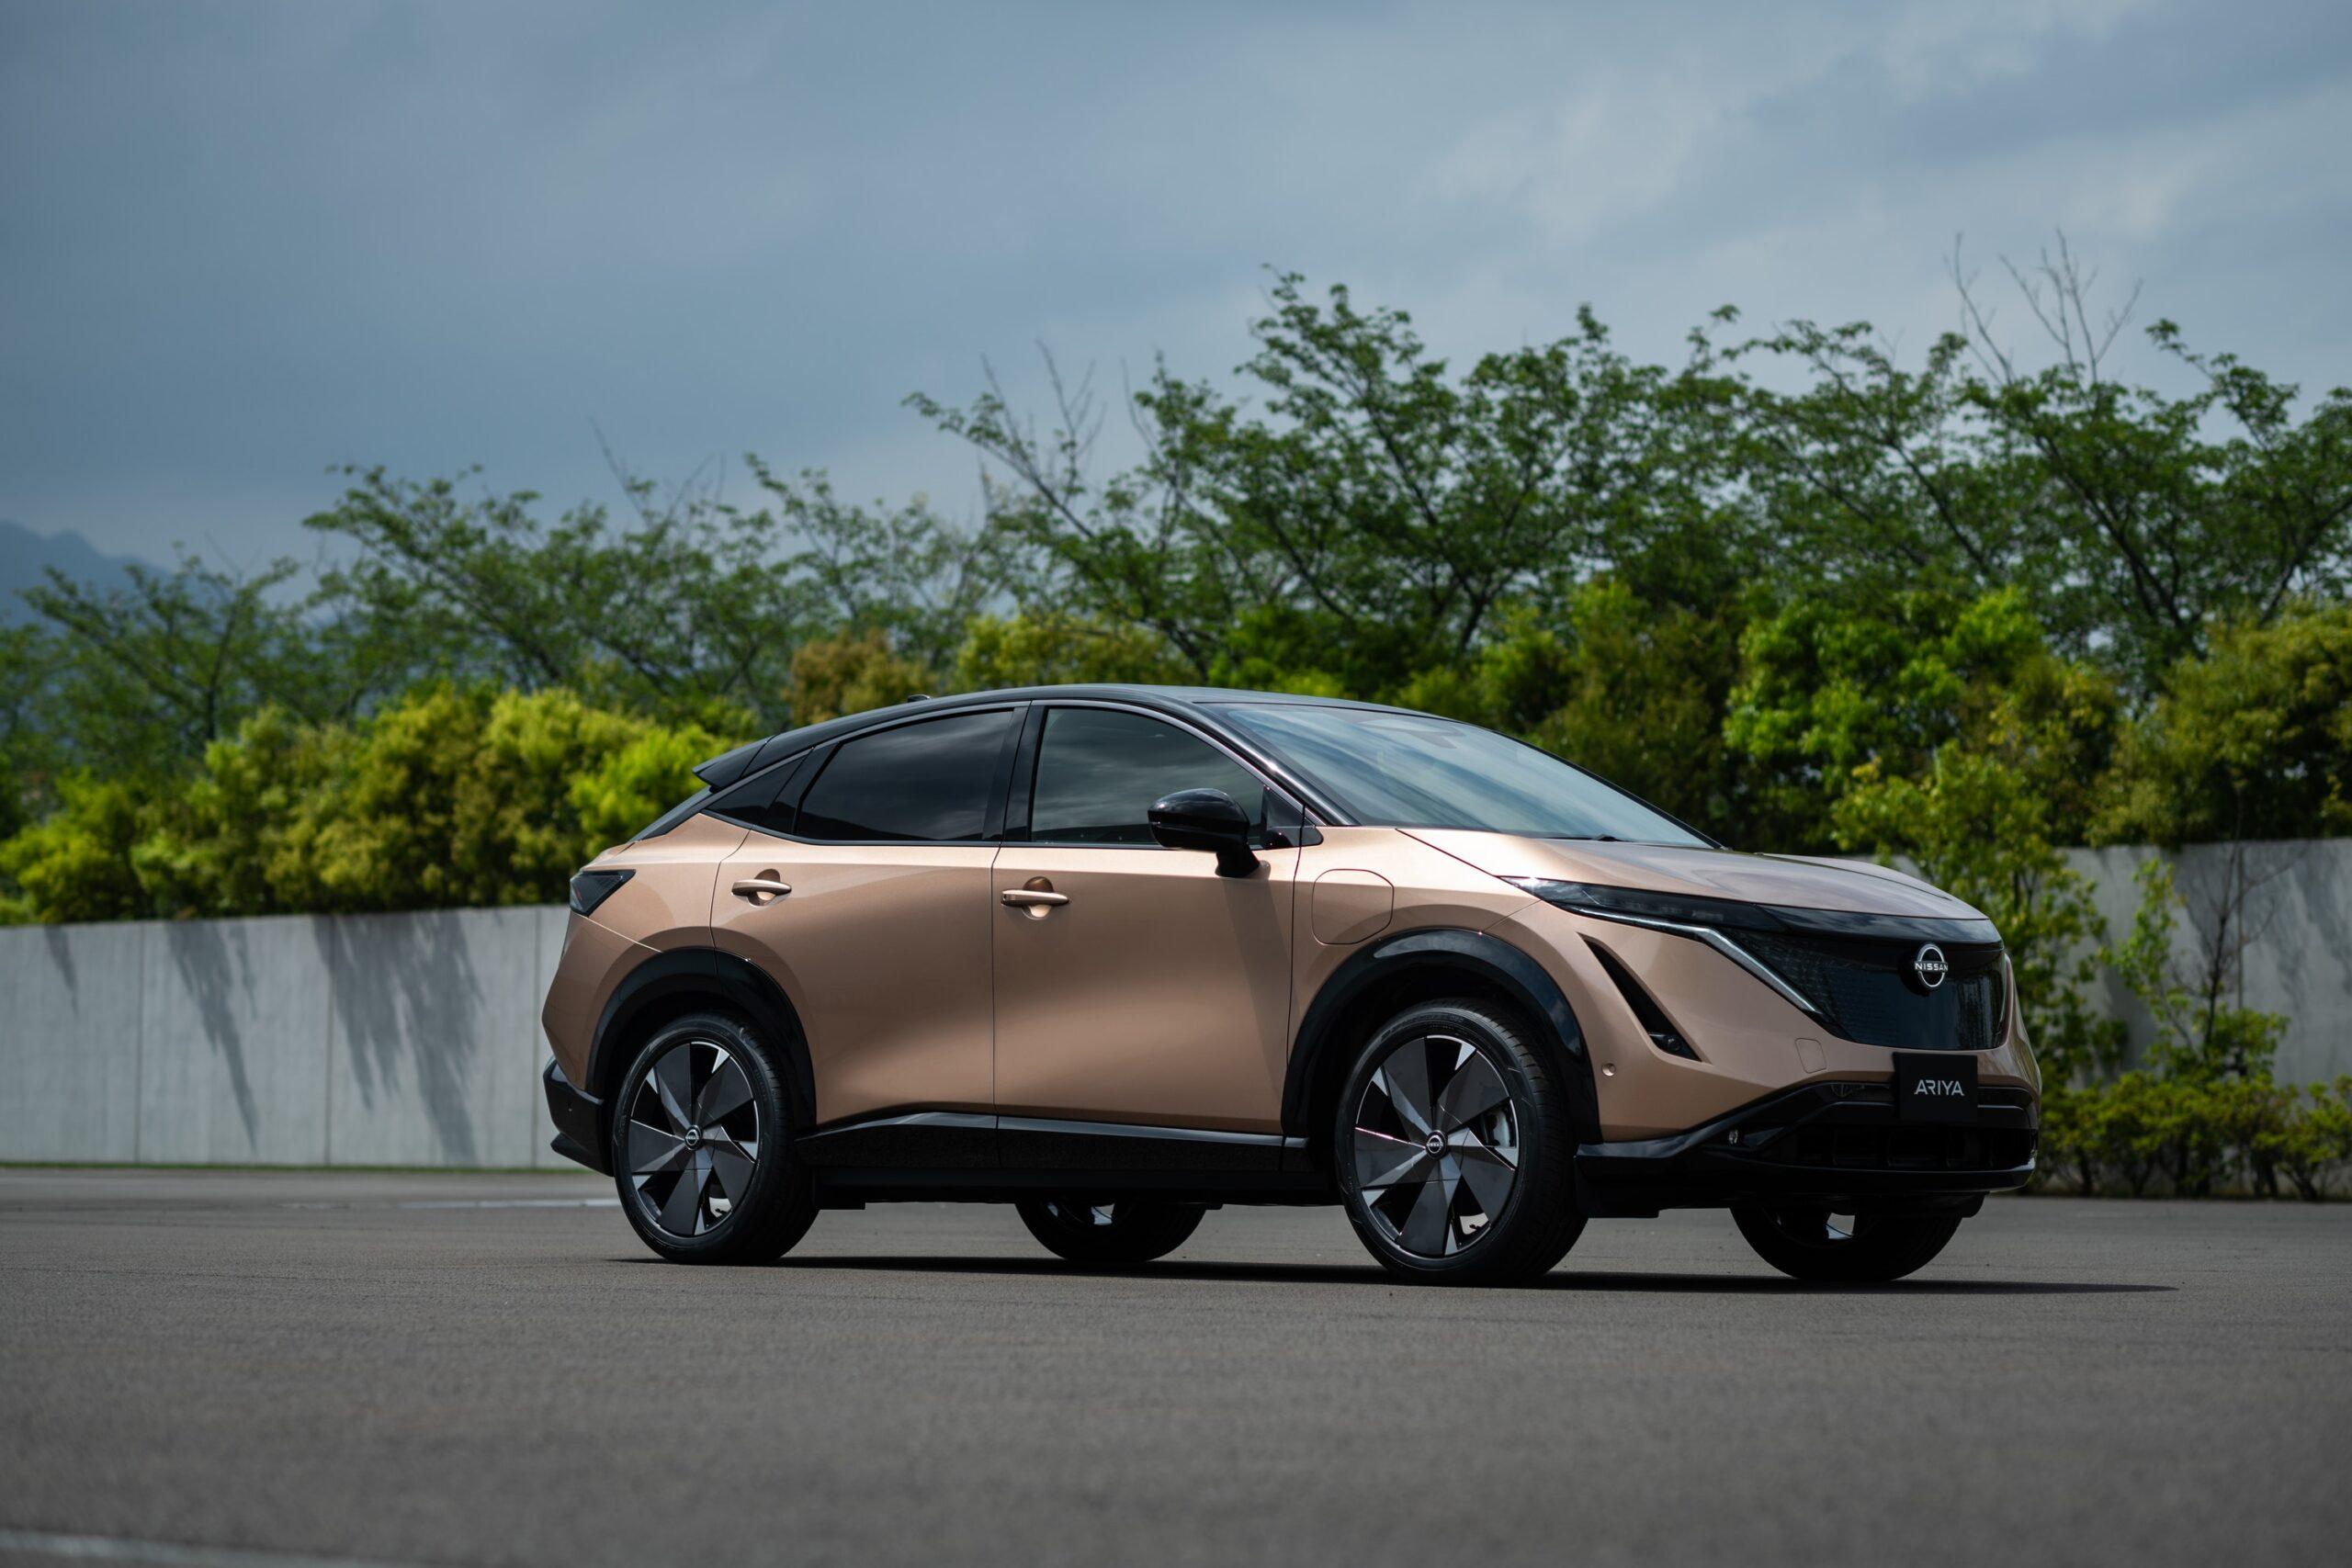 Nissan reveals dramatic new Ariya